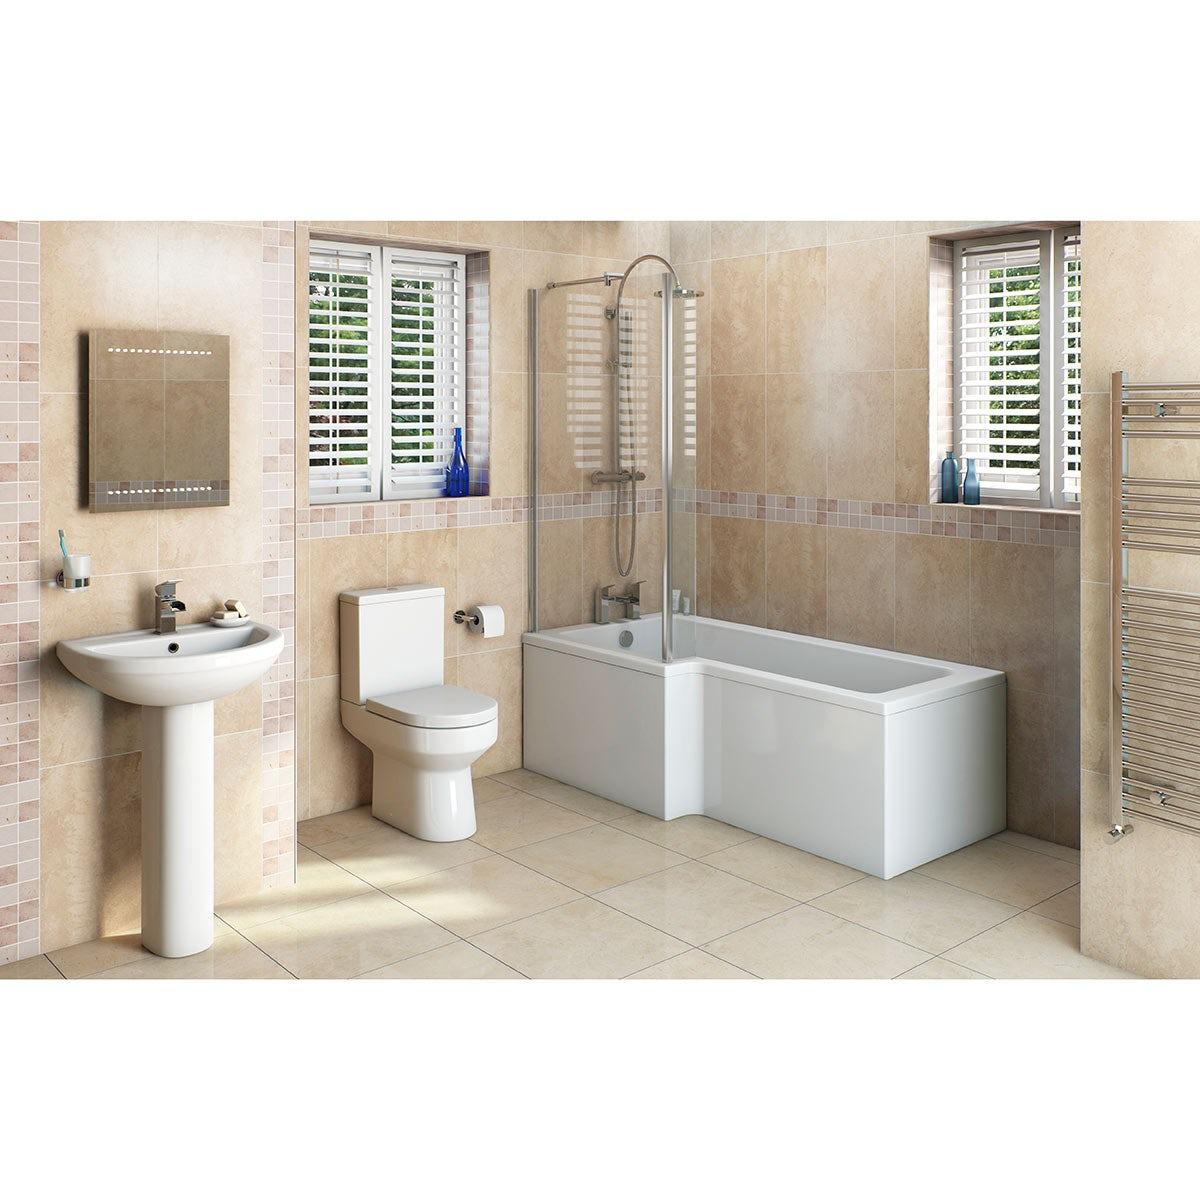 Oakley Bathroom Suite with Boston 1700 x 850 Shower Bath LH